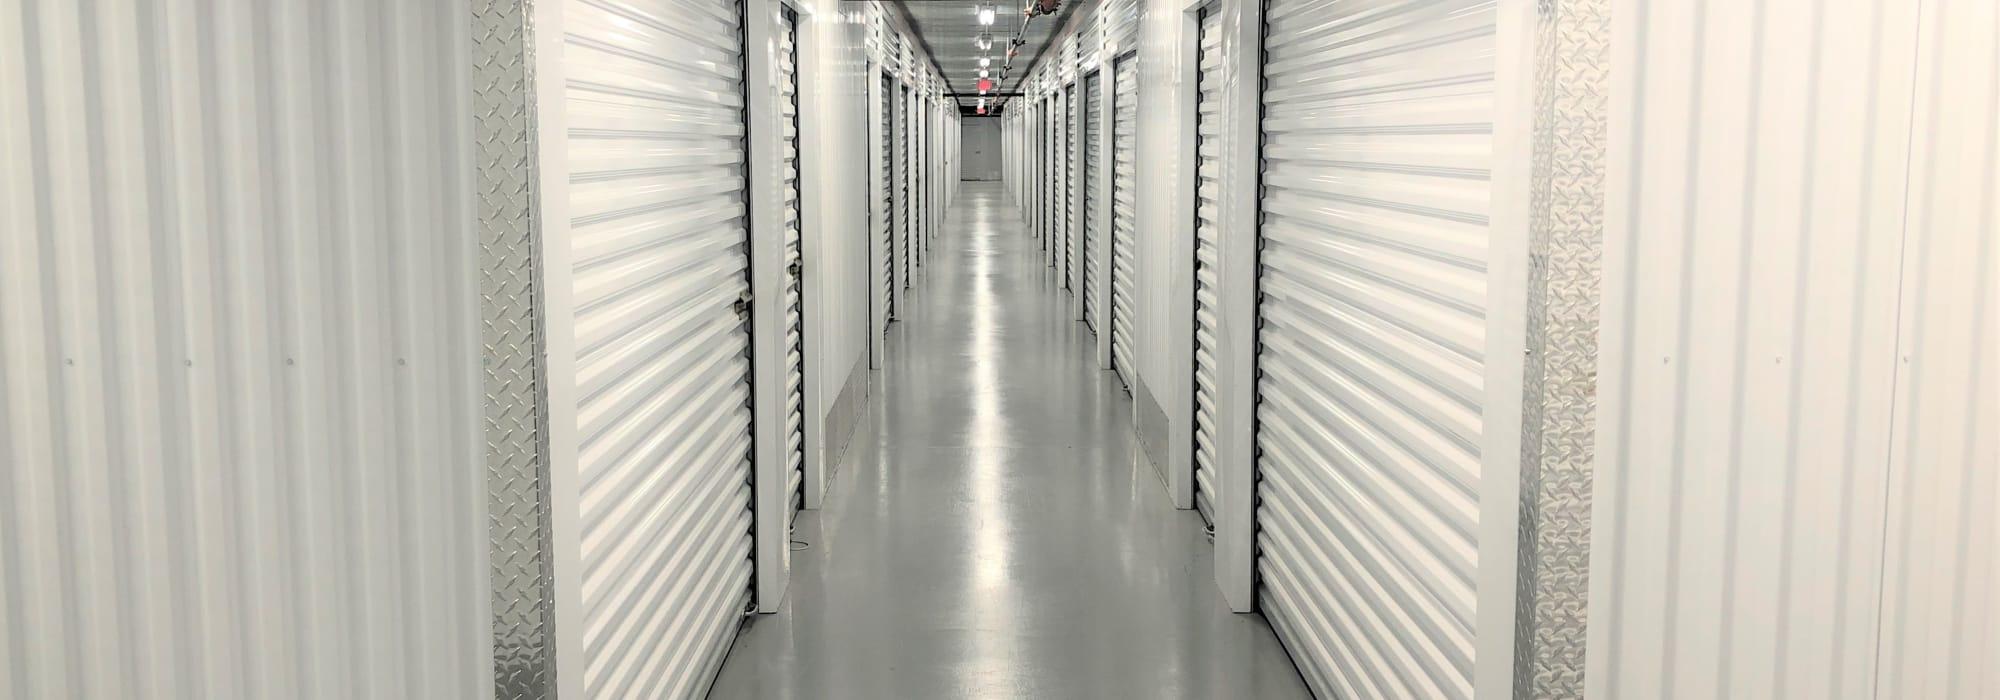 Storage 365 self storage in St. Paul, Minnesota